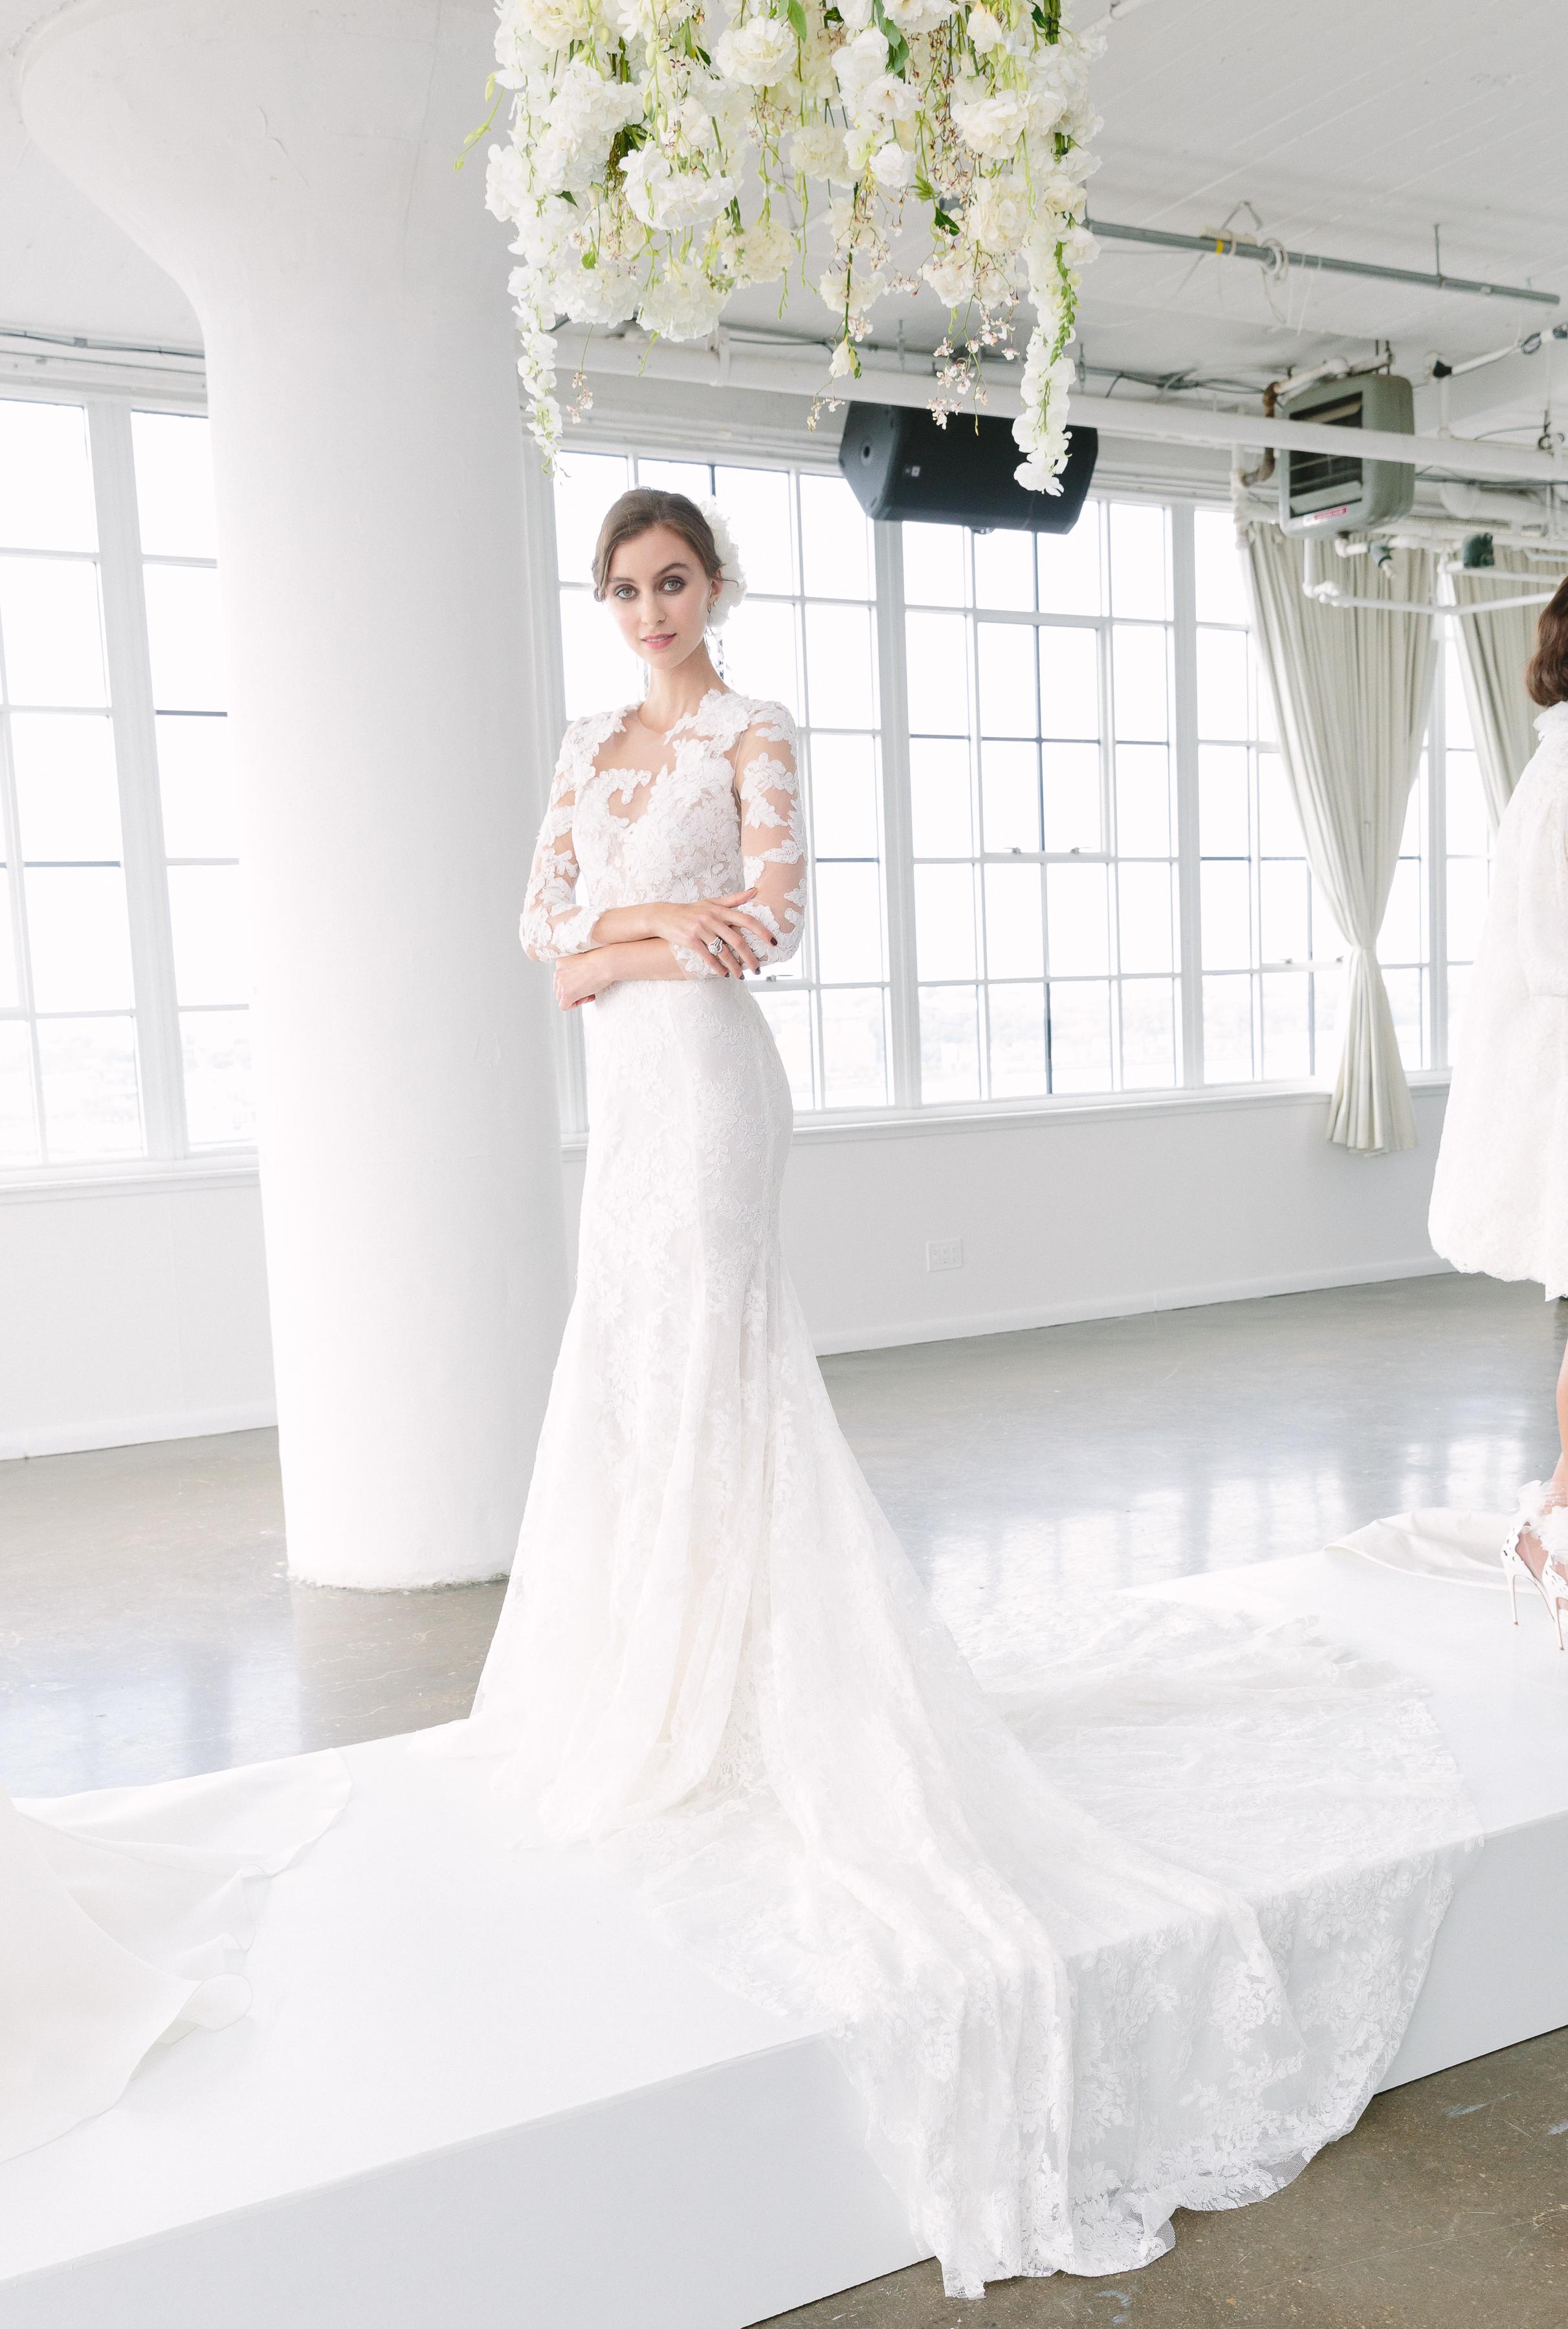 Marchesa Fall 2018 Wedding Dress, lace sheath with long sleeves